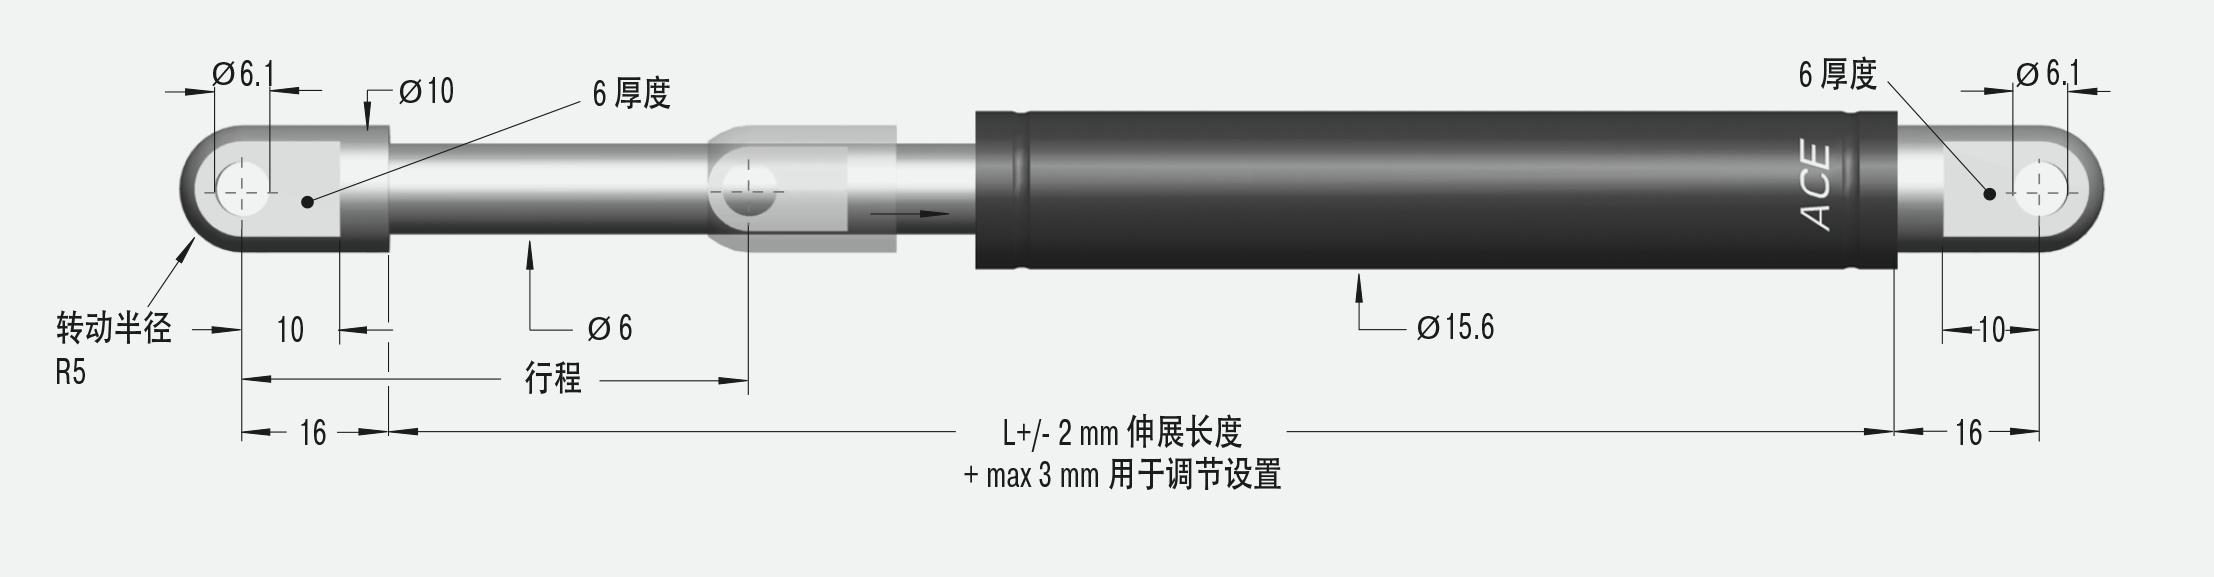 HB-15-100